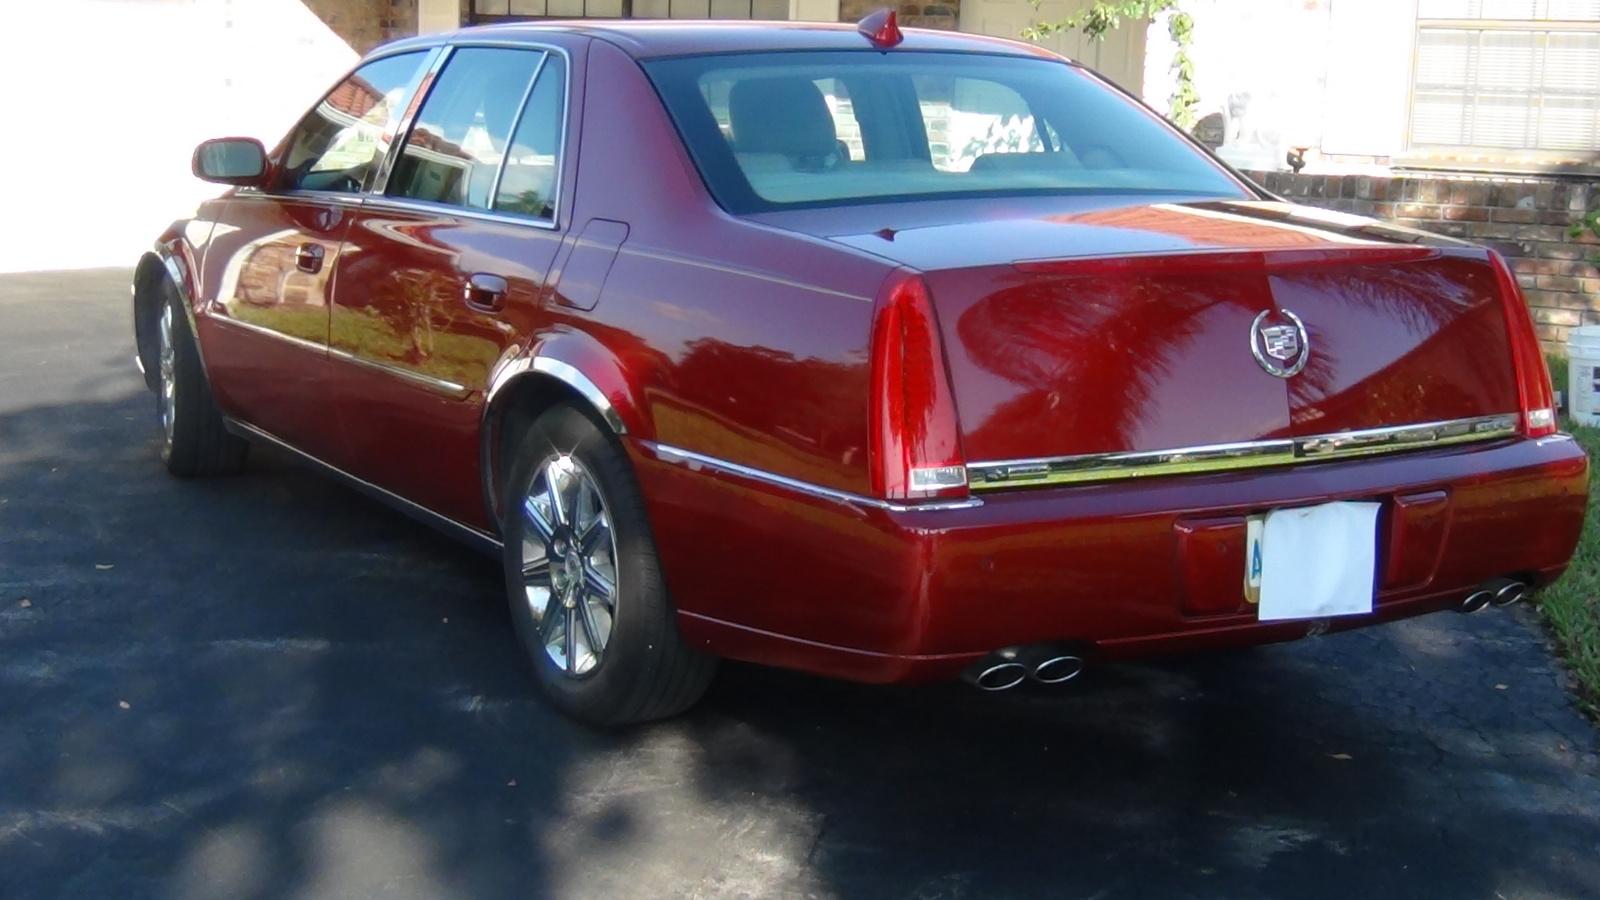 2011 Cadillac DTS - Pictures - CarGurus